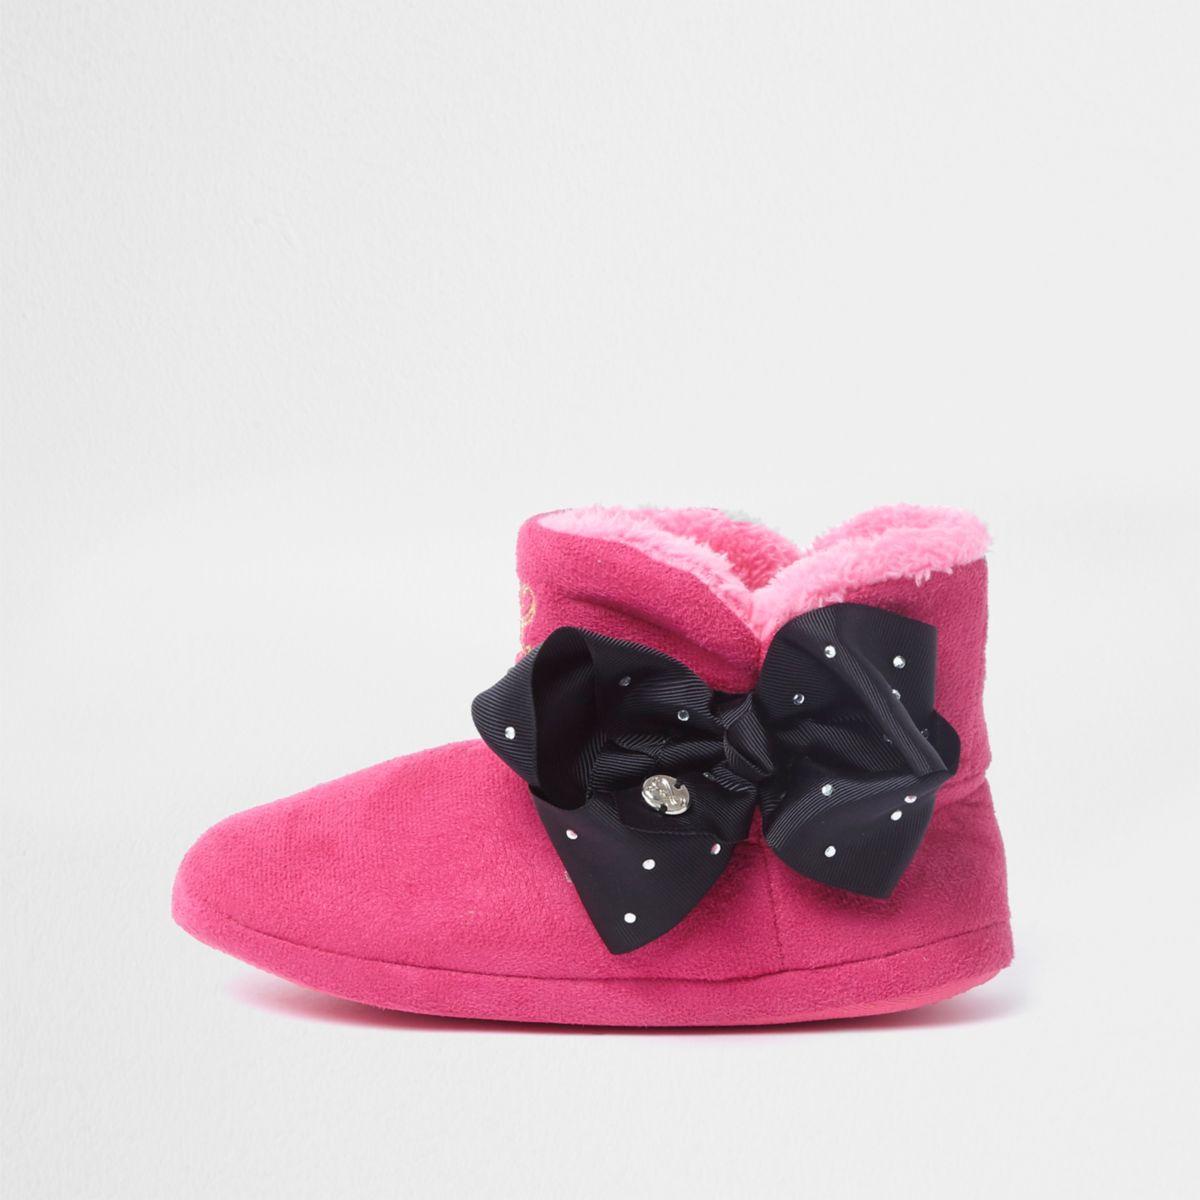 JoJo Bows – Pinke Boots-Stiefel